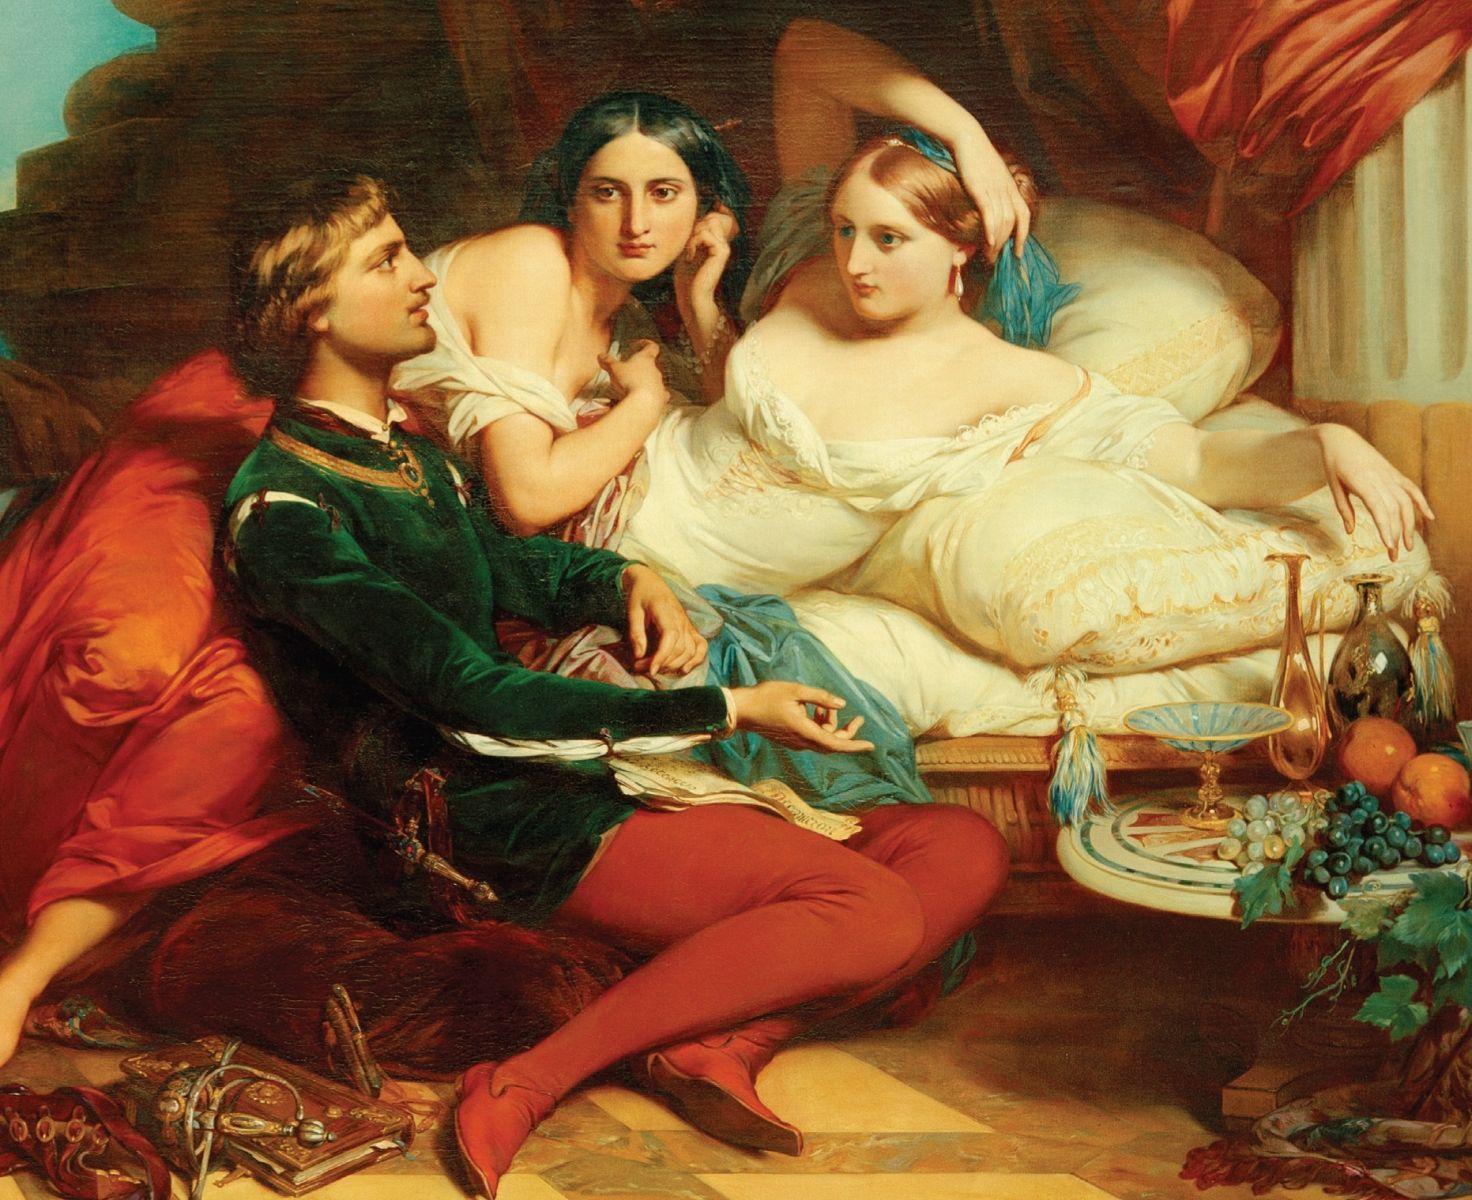 Какие книги научили нас эротике - фото №1